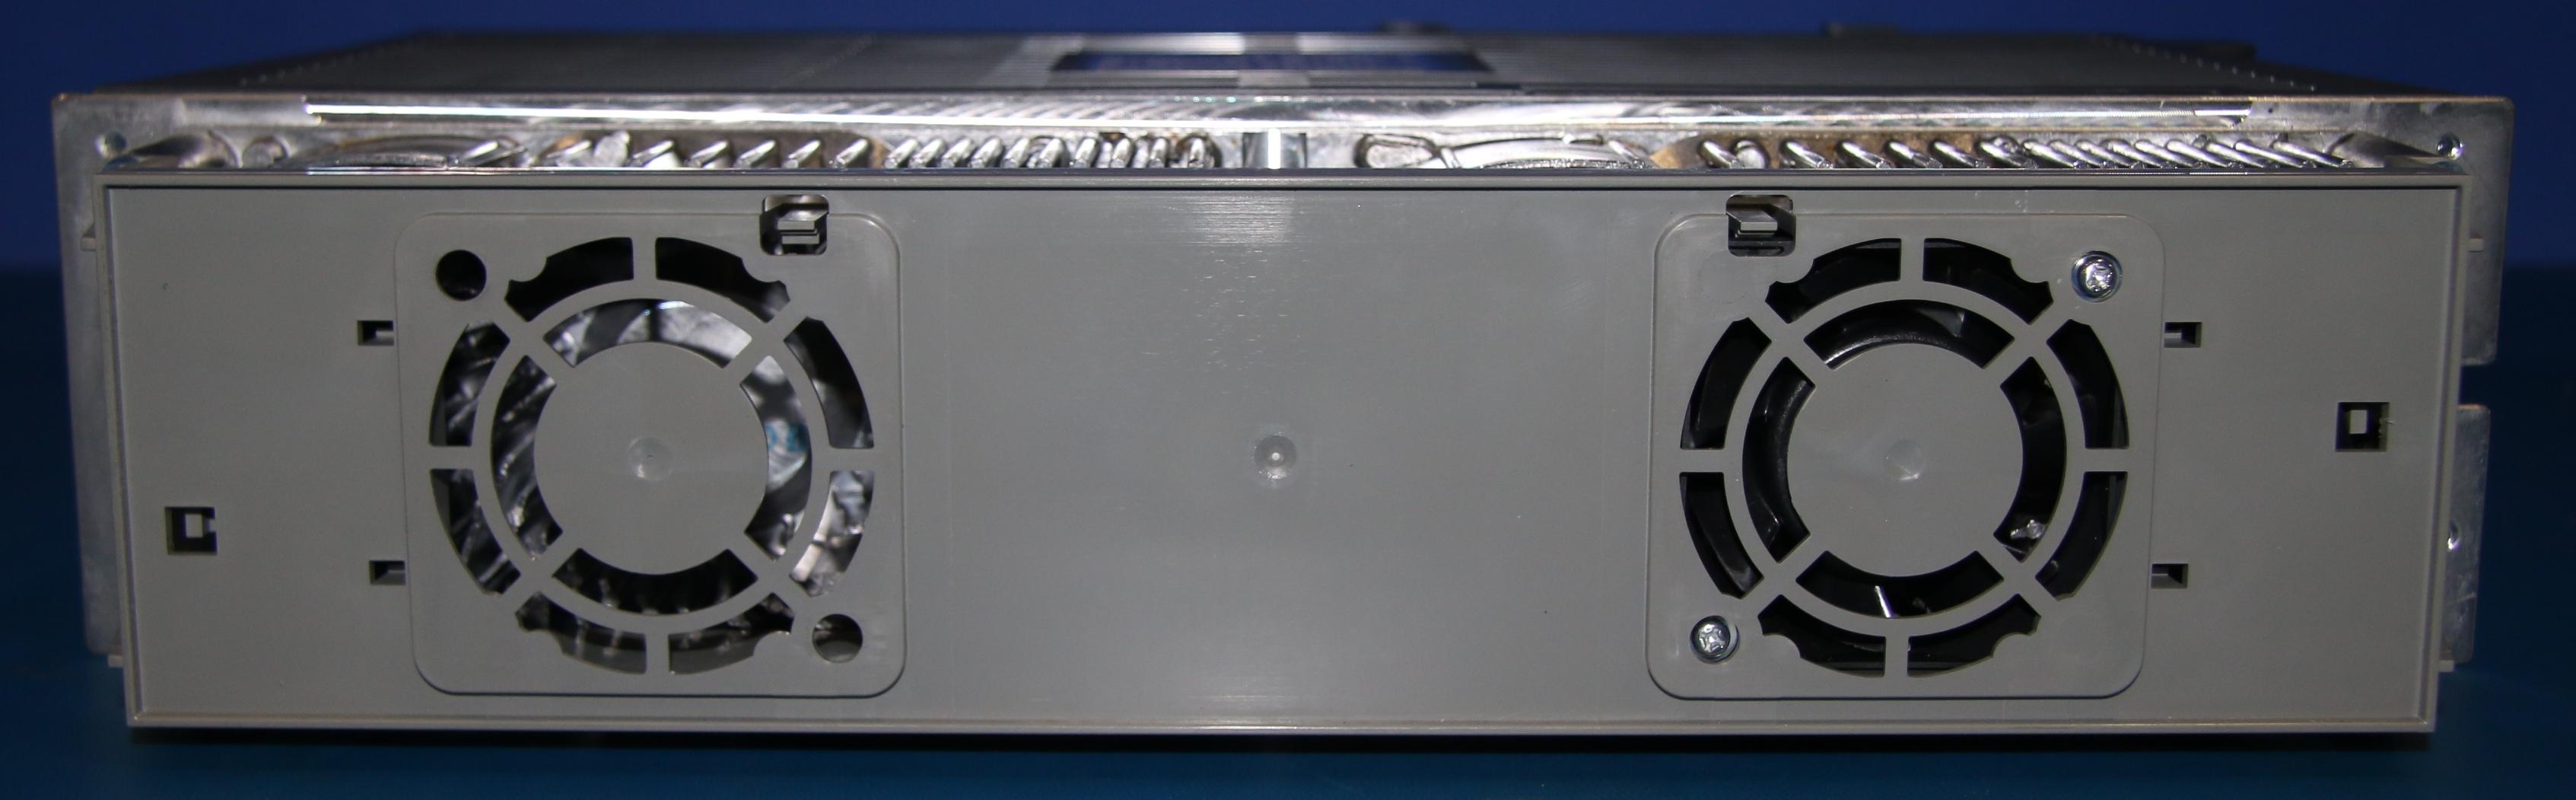 (1) New Mitsubishi MDS-D-CV-110 Power Supply Unit 15093